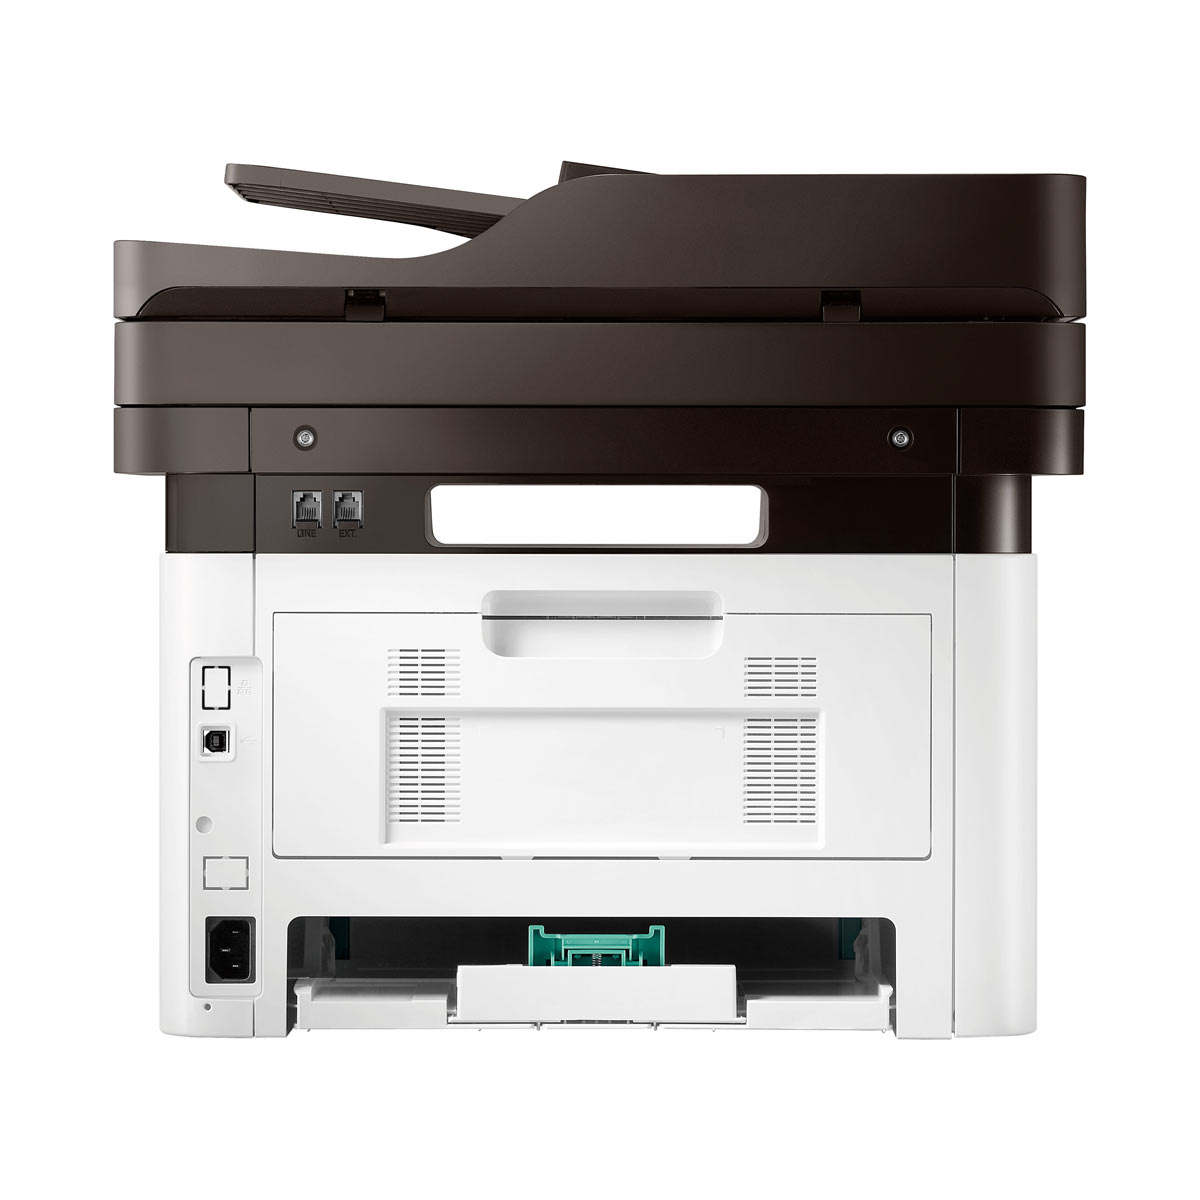 Imprimante multifonction Samsung SL-M2675FN - Cybertek.fr - 4